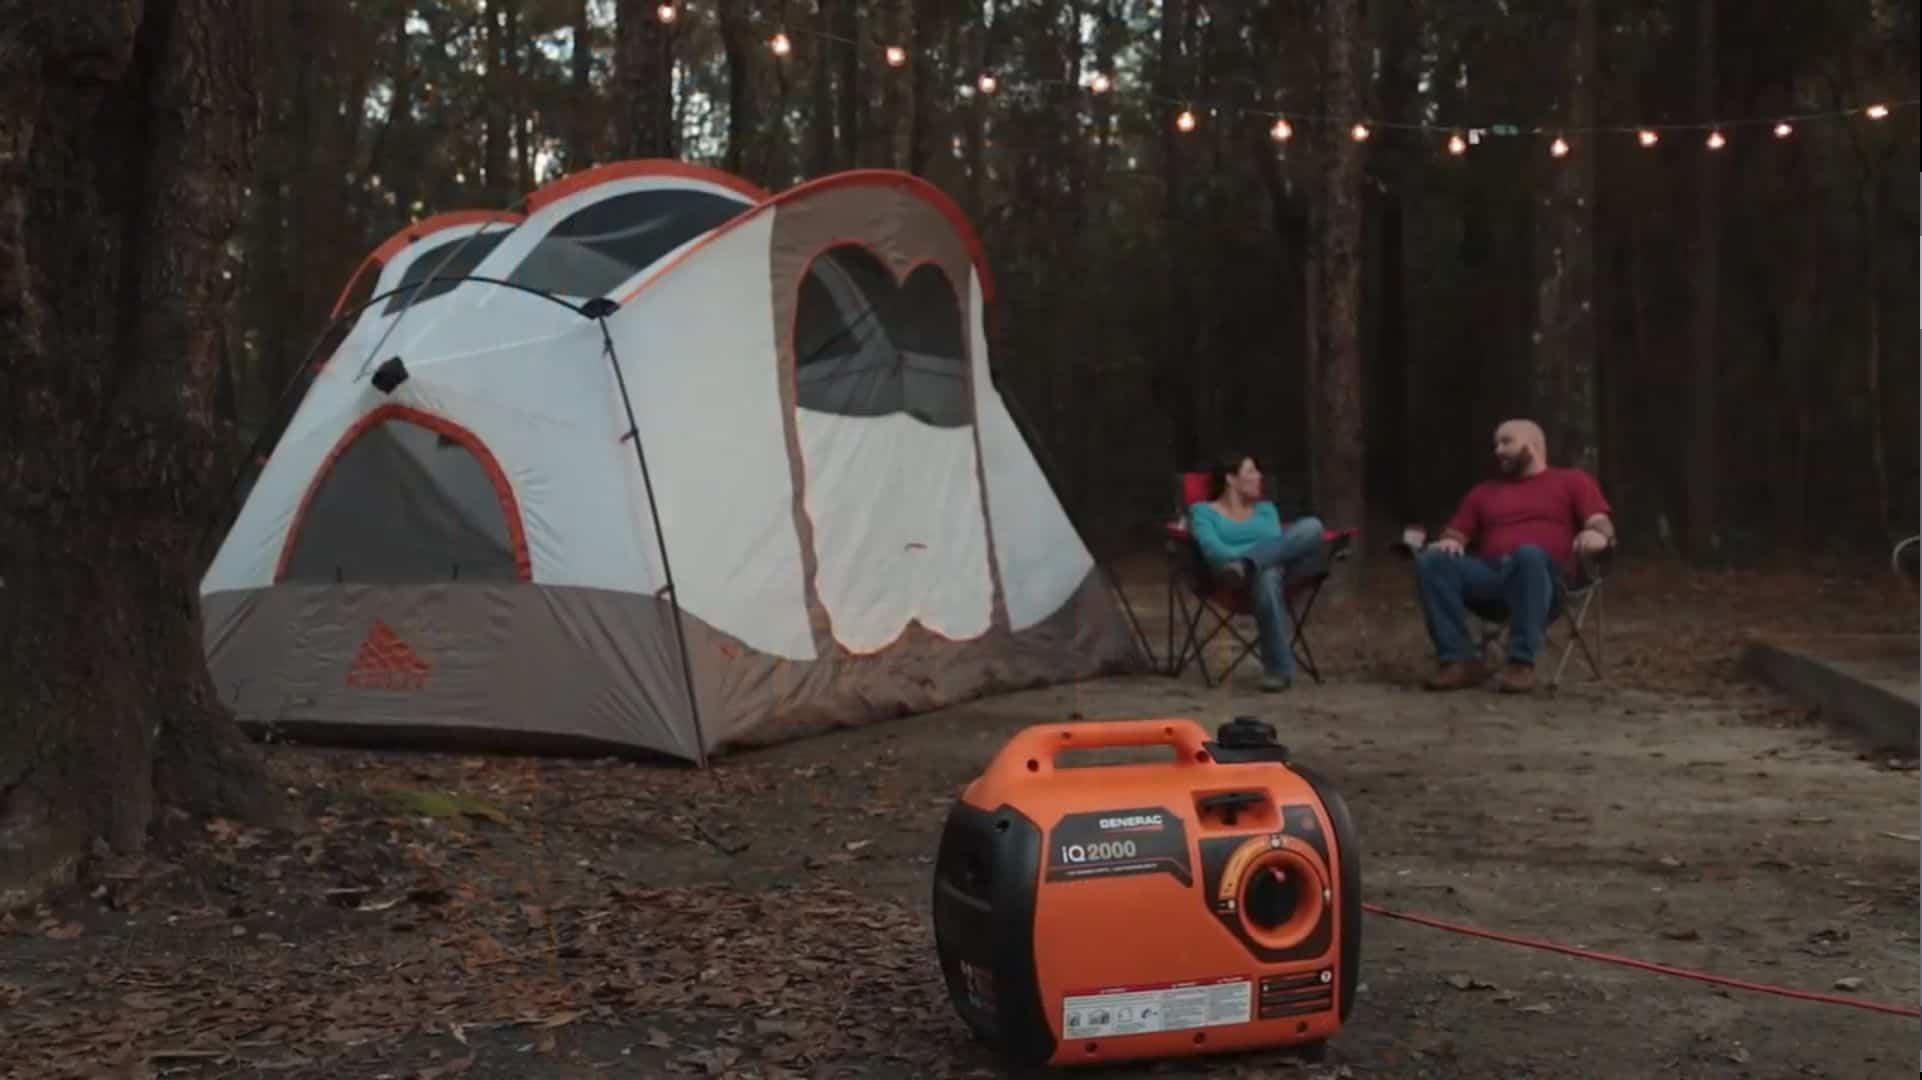 Generac iQ2000 Portable Inverter Near Tent